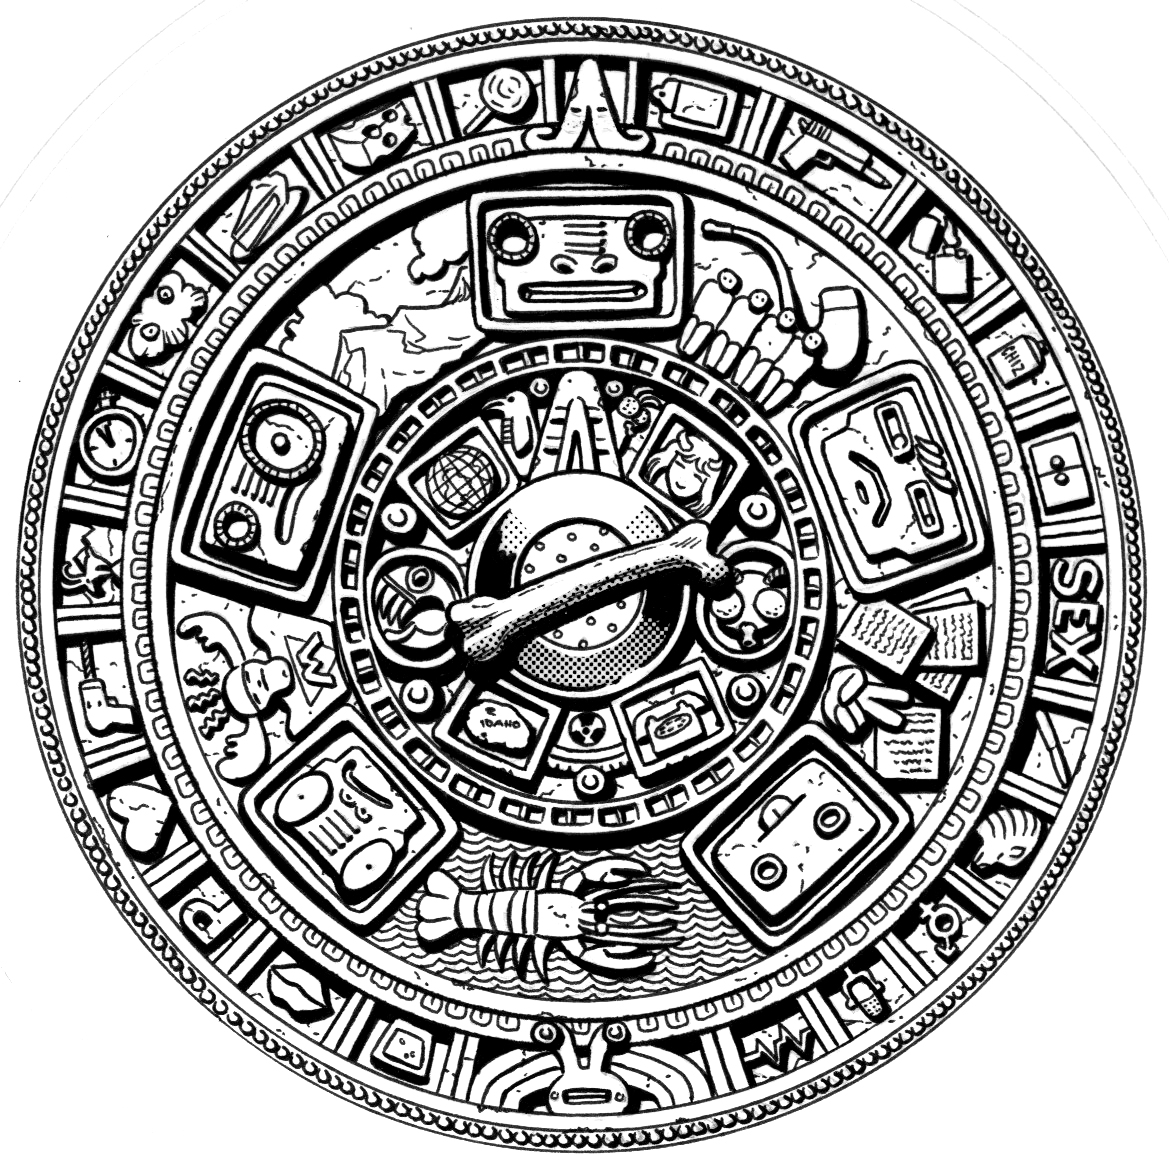 Mayan Calendar Vector Art : Bonefish mayan bonewheel by steampoweredmikej on deviantart